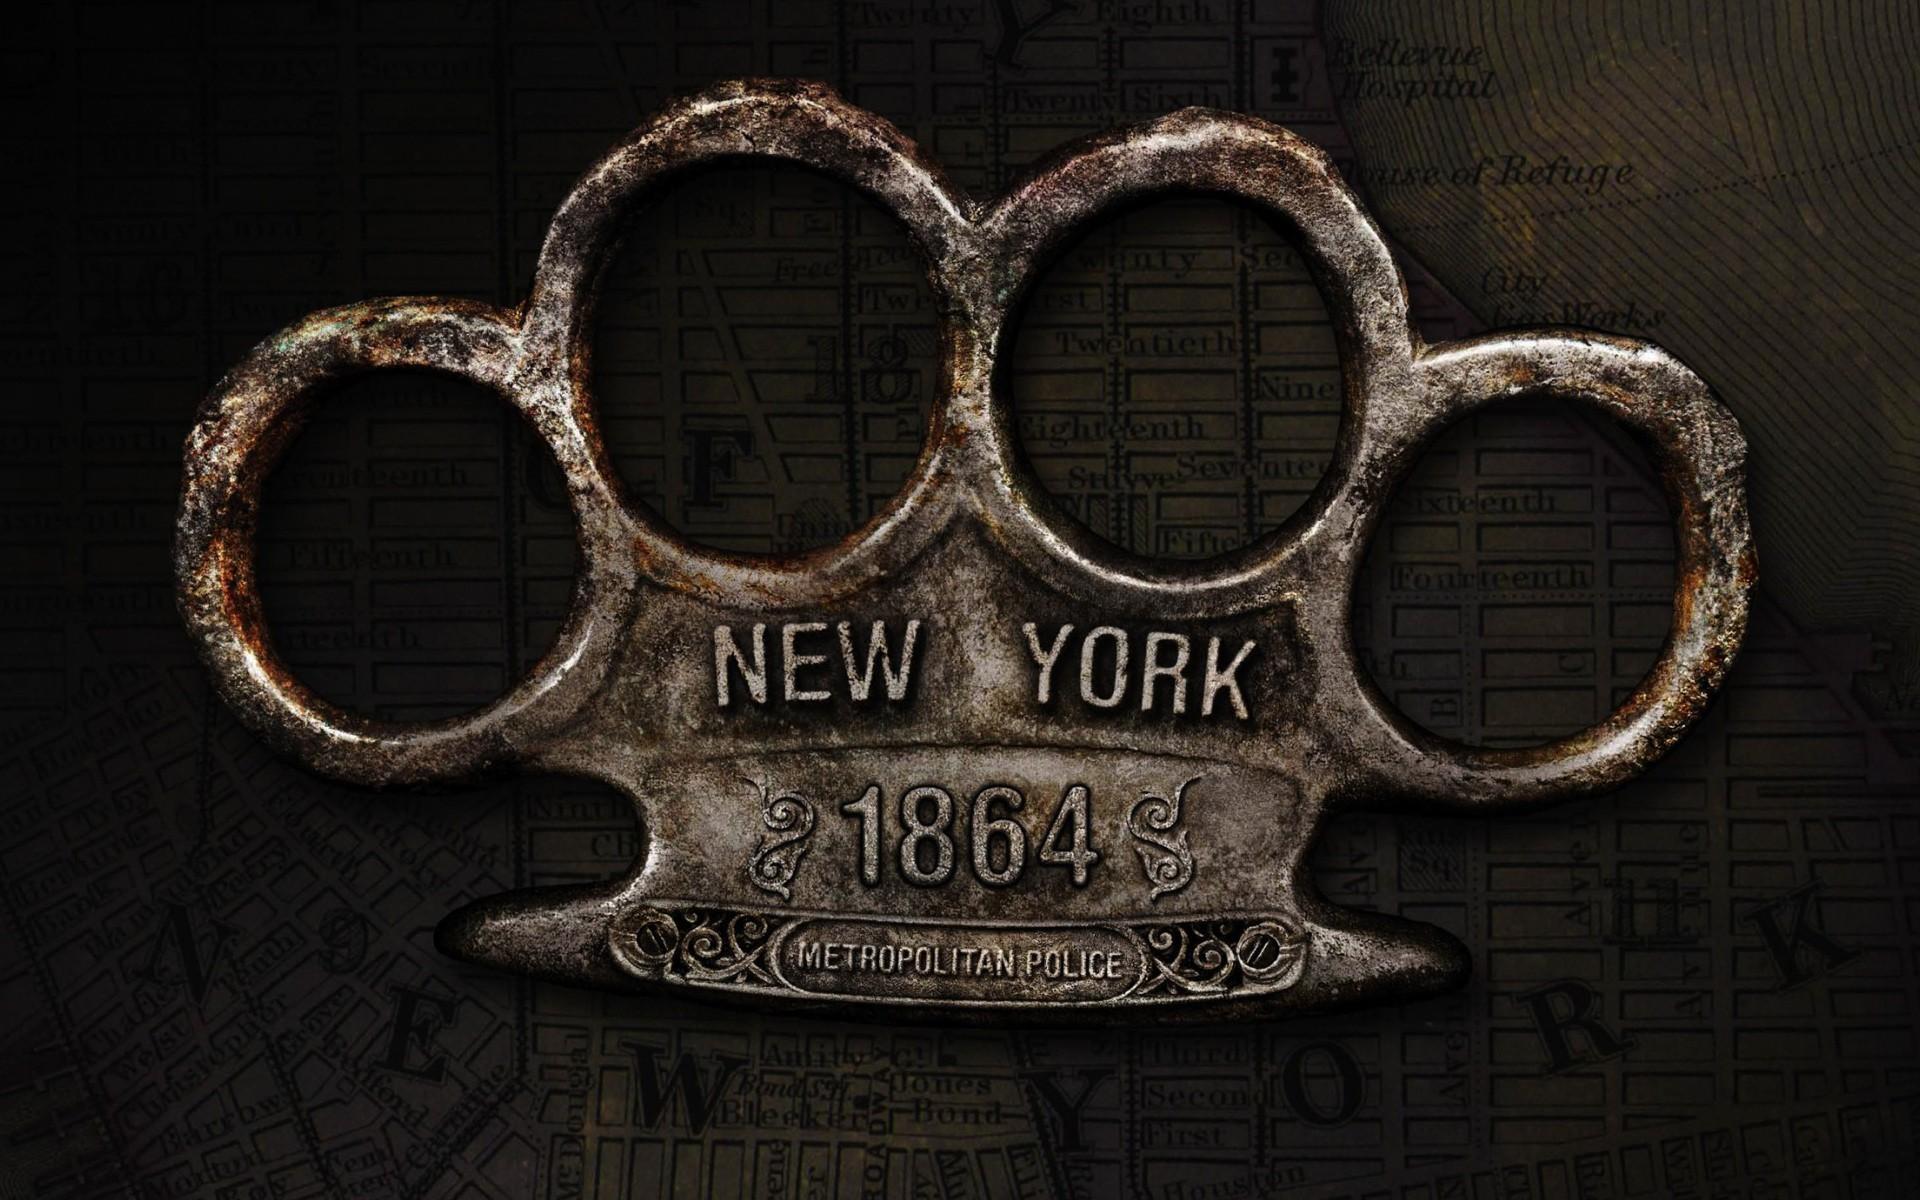 Desktop Wallpaper – police new york city metropolitan 1864 knuckle .